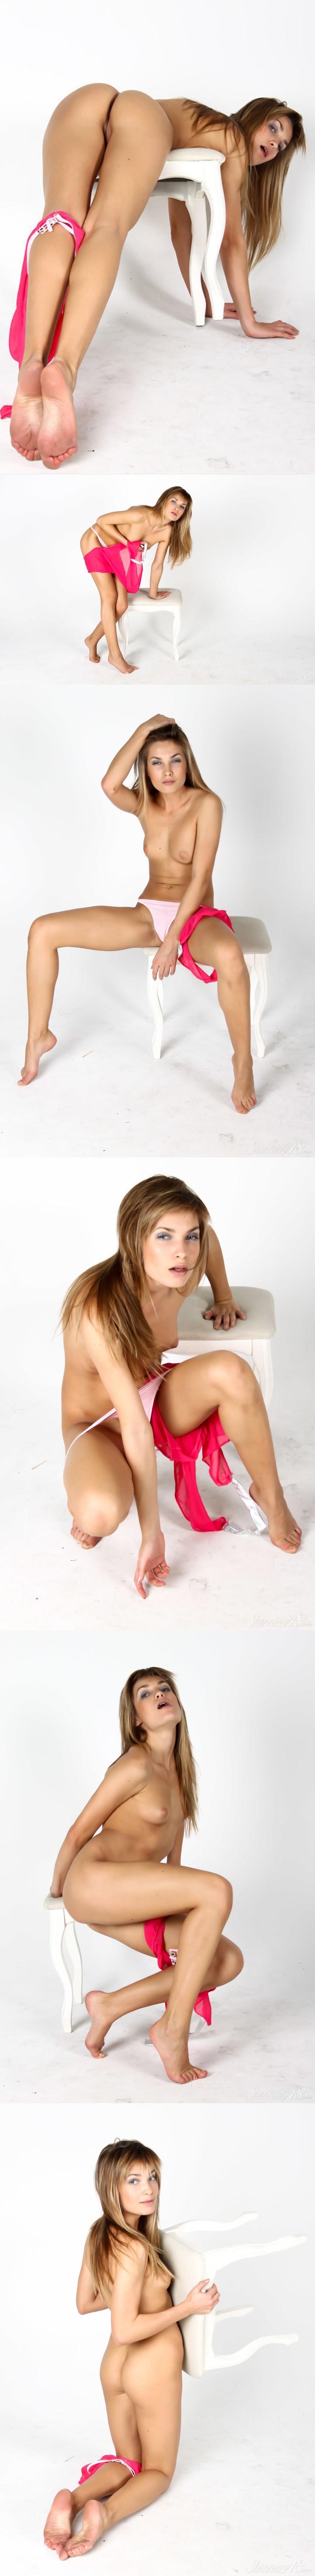 [Stunning18] Martina - Stool sexy girls image jav